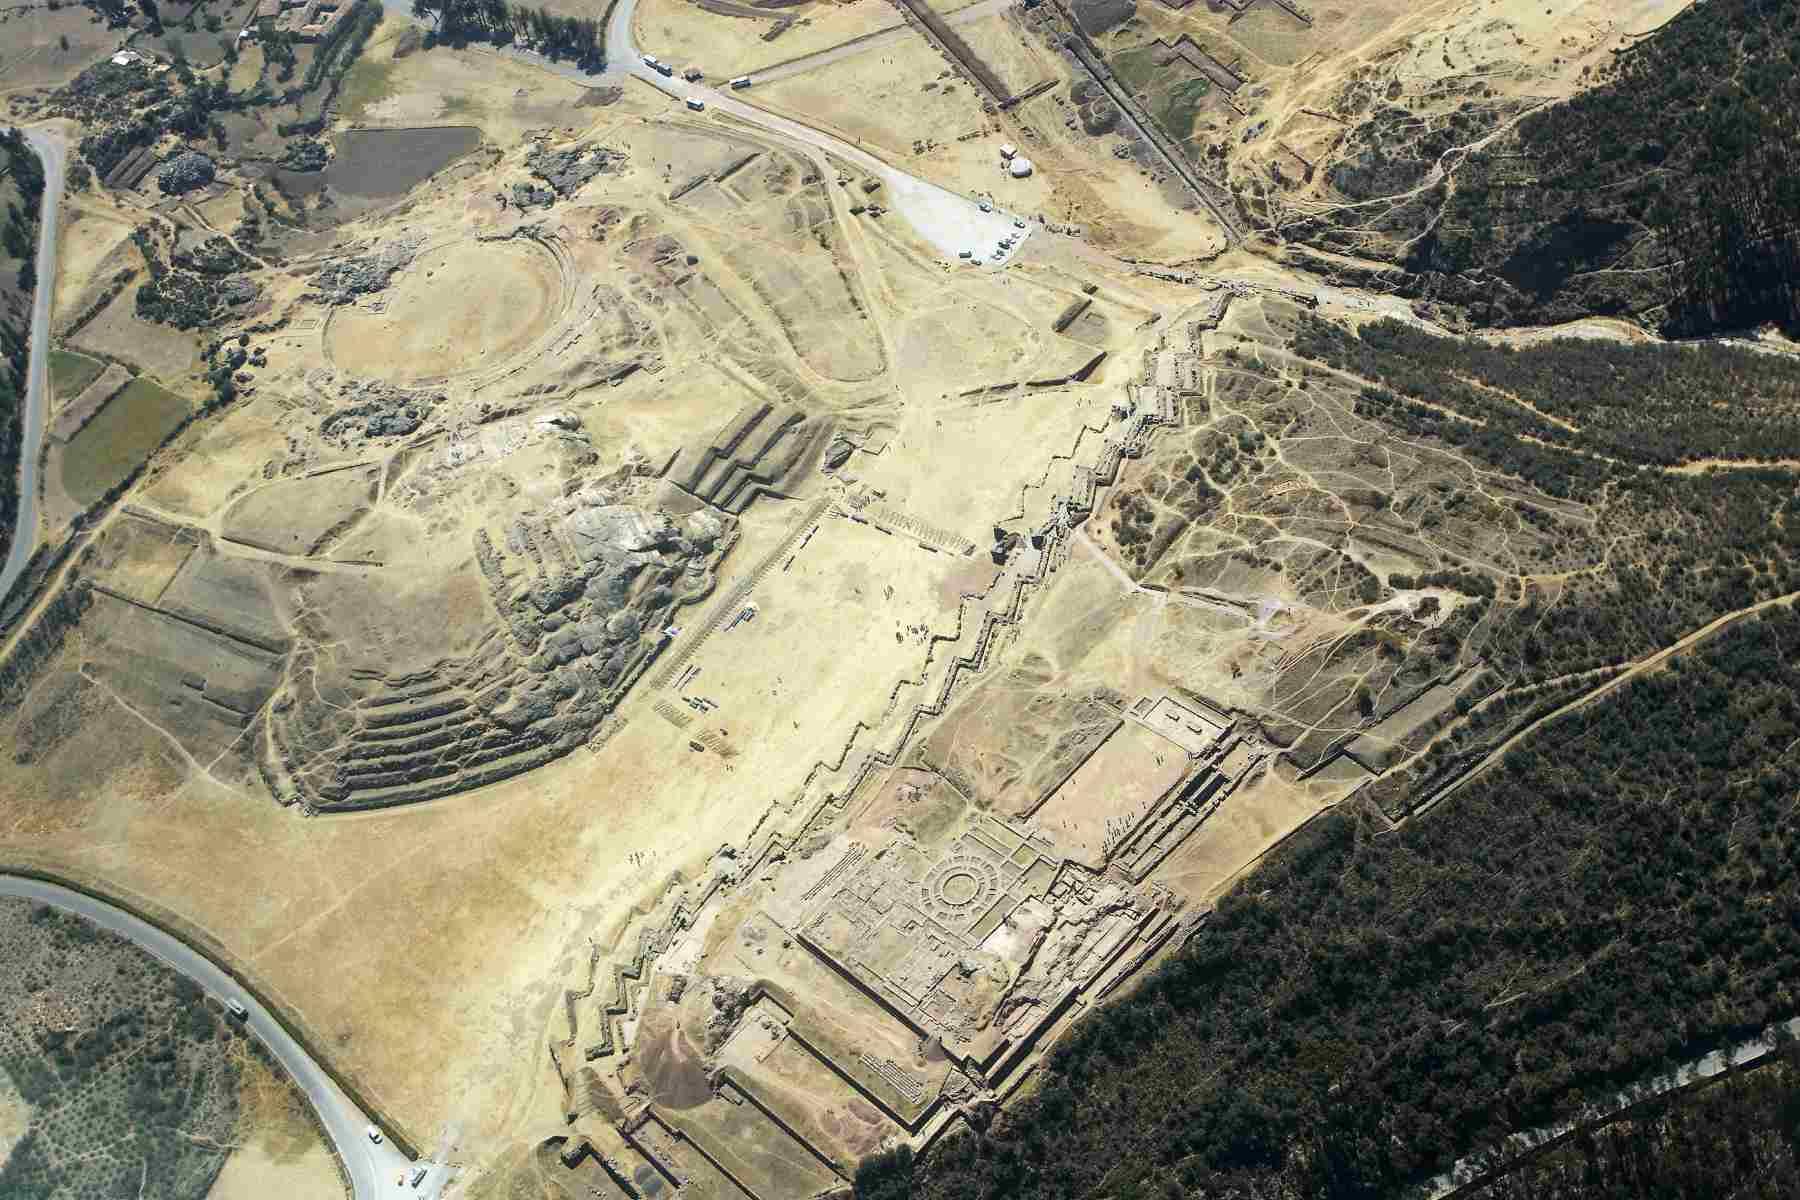 Aerial photo of Saqsaywaman, Cusco.